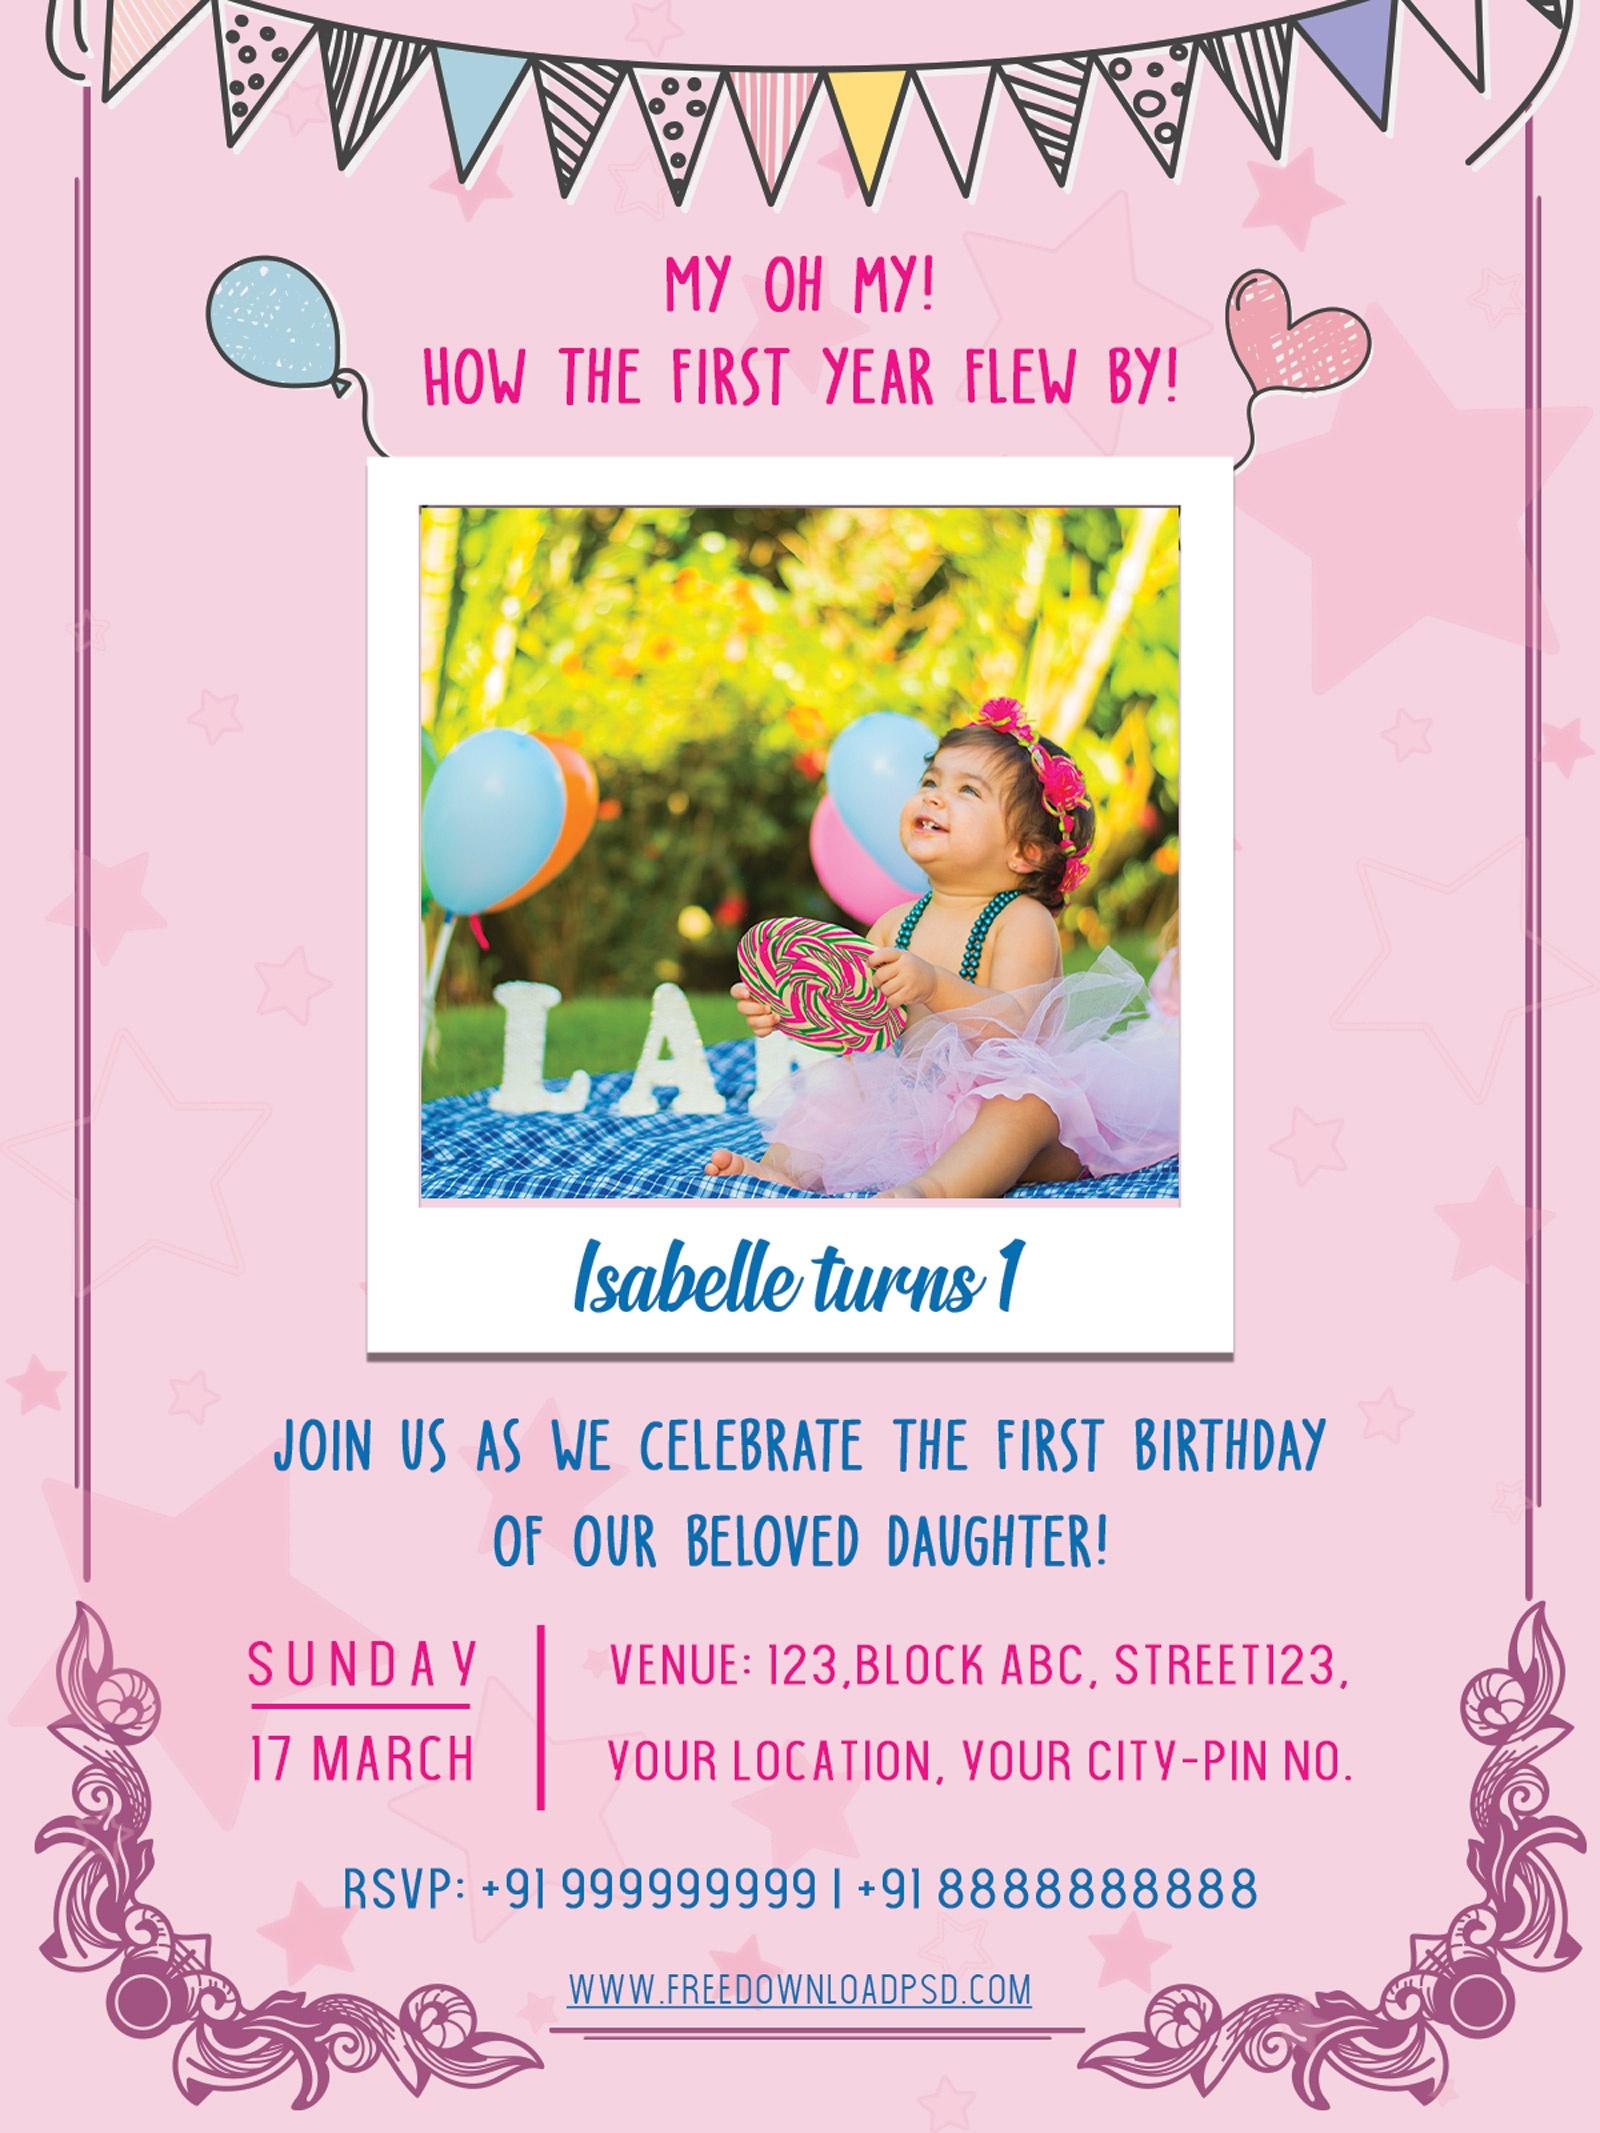 Birthday Party Invitation Psd Flyer | Freedownloadpsd - Free Printable Birthday Party Flyers